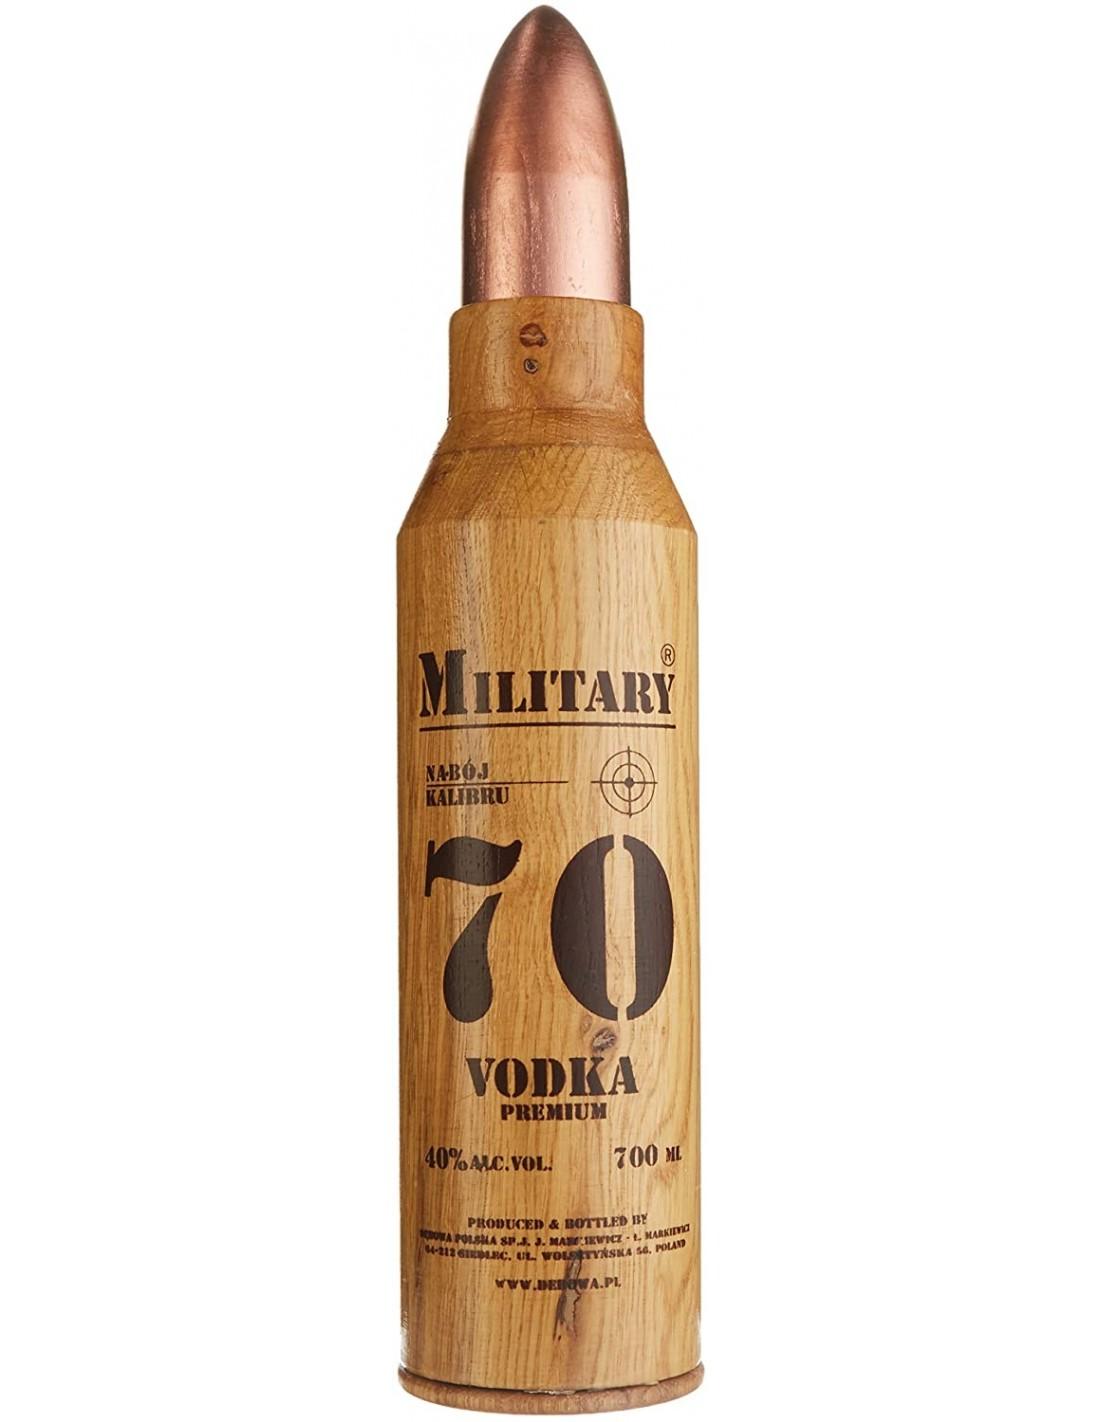 Vodca Military Debowa Premium, 40% alc., 0.7L, Polonia